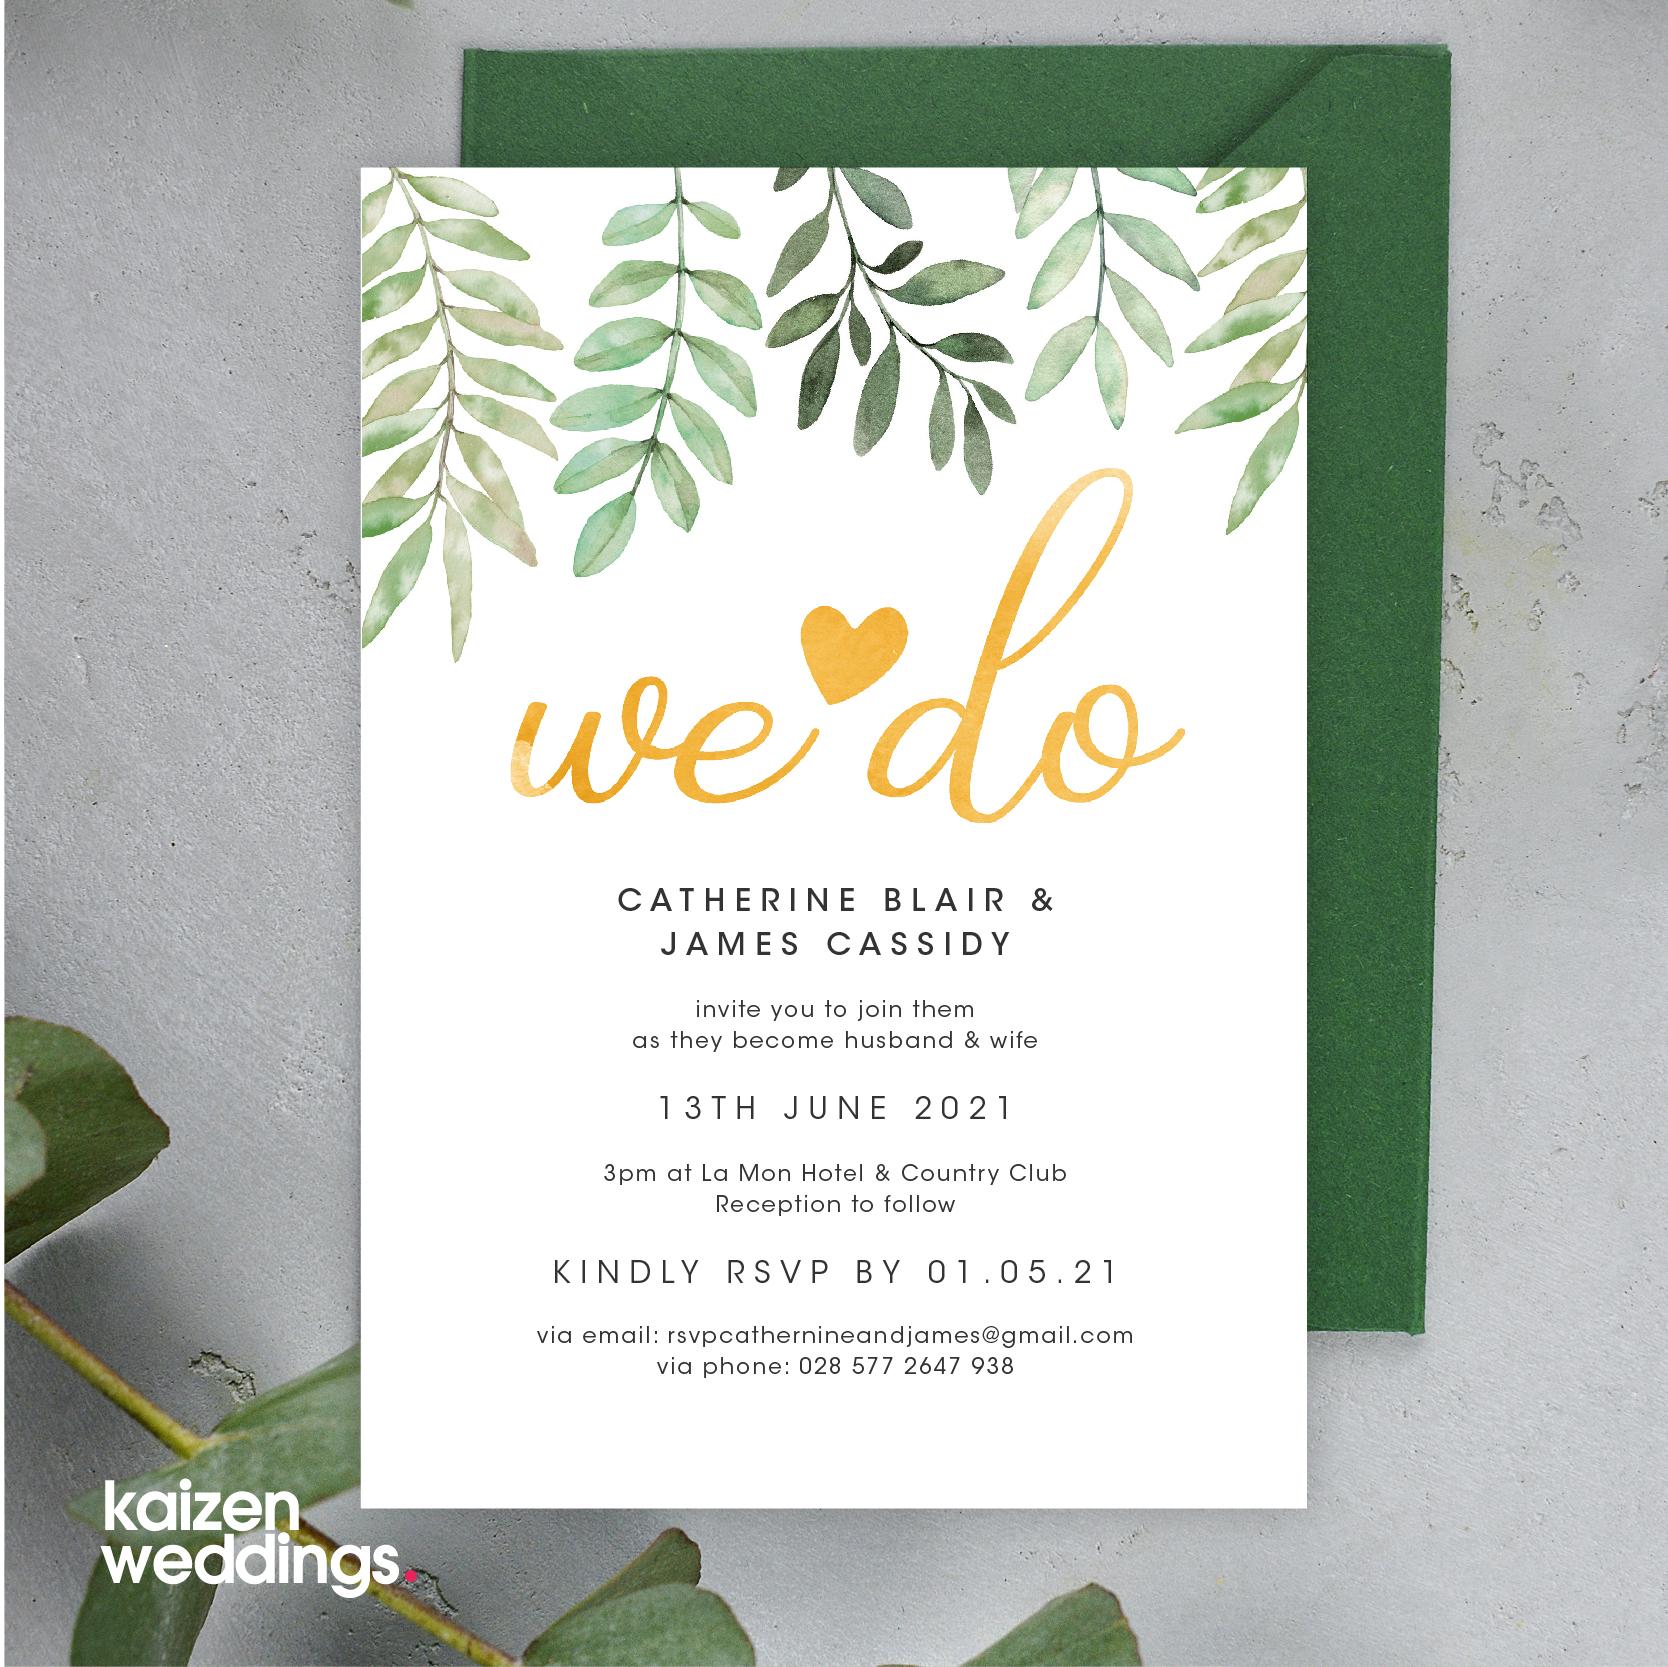 Most Unique Wedding Ideas: Tips And Ideas For Unique Wedding Invitation Designs